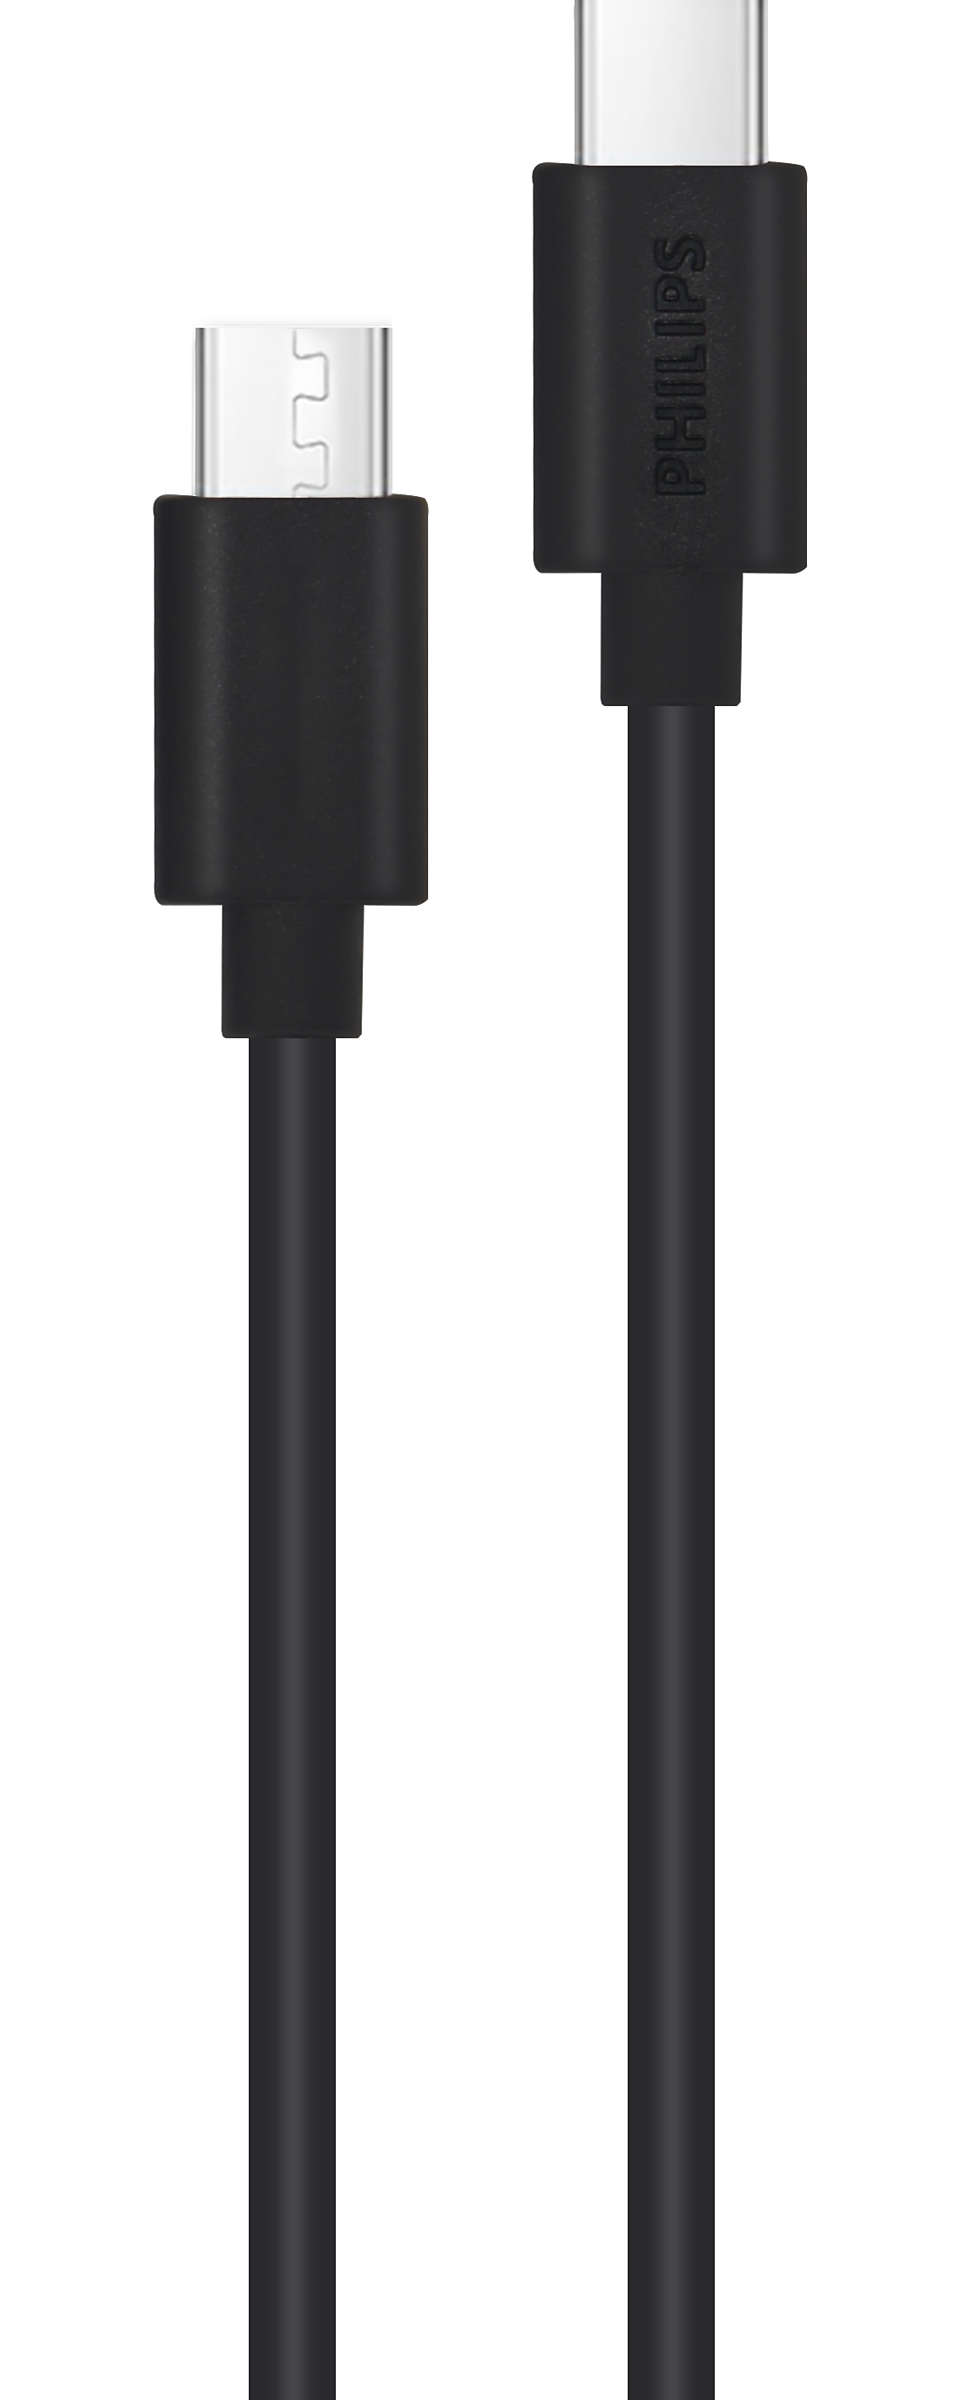 Câble USB-C vers USB-C de 2m